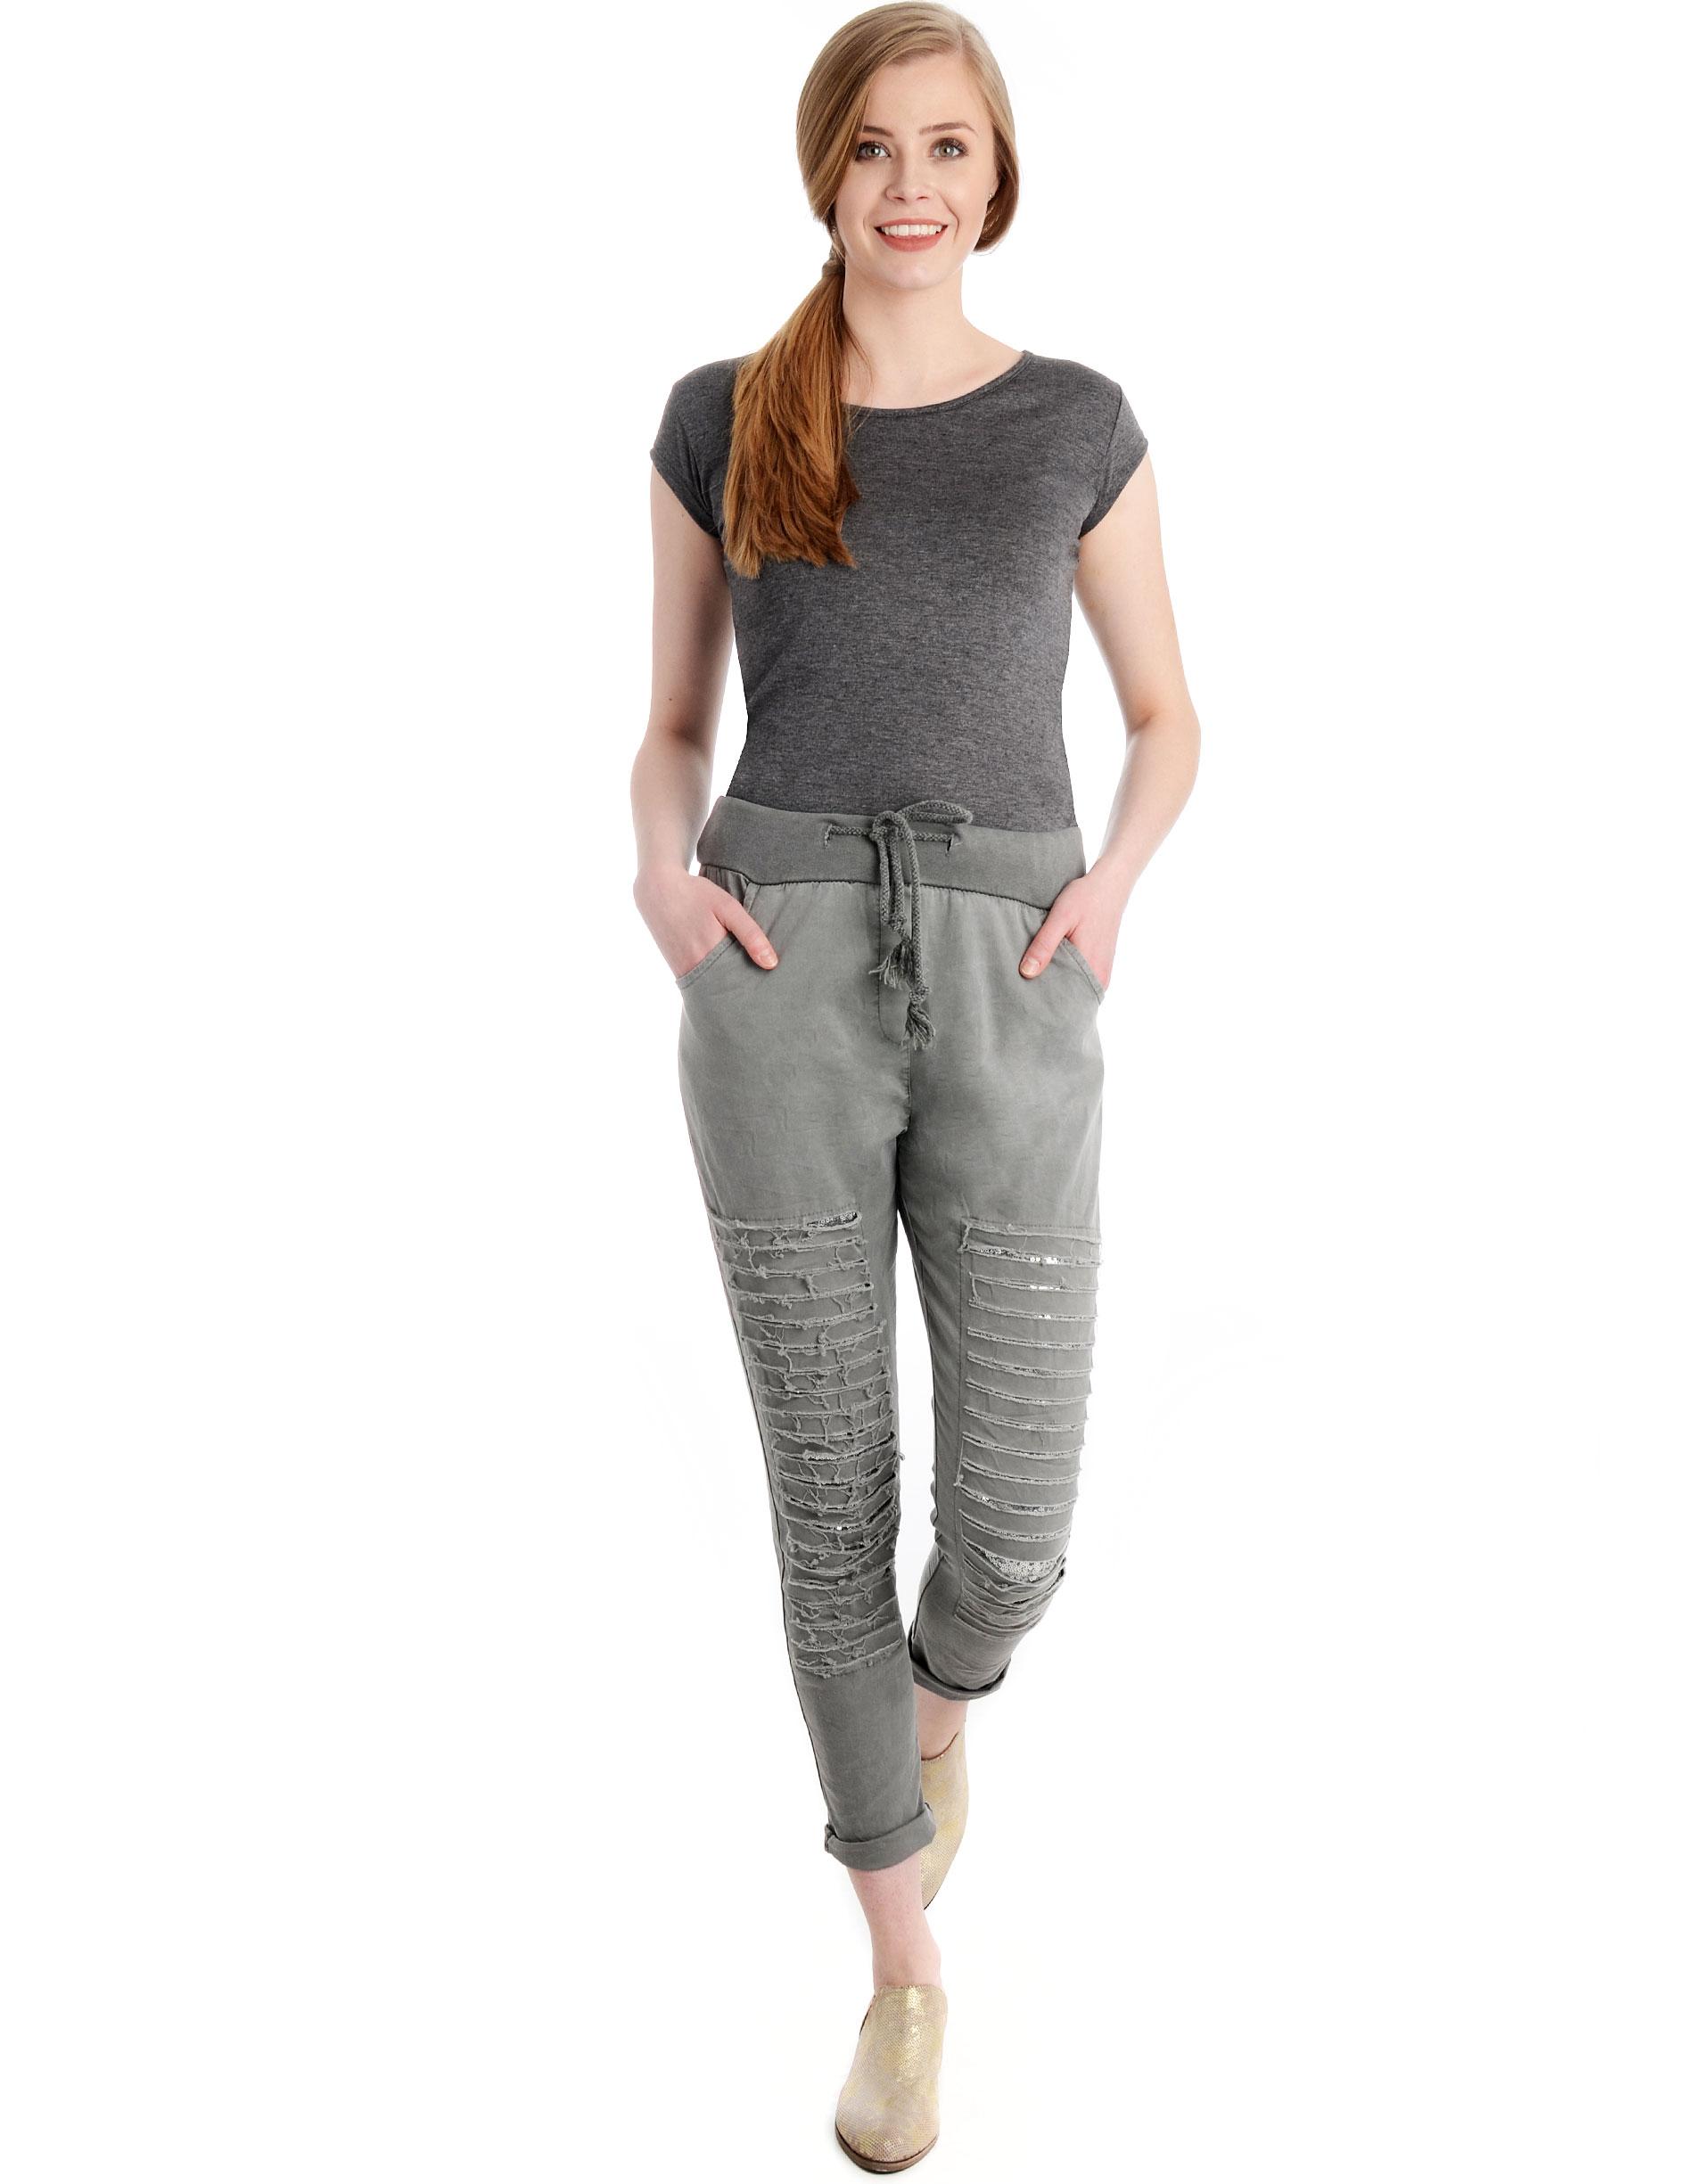 Spodnie - 141-P016 GRME - Unisono